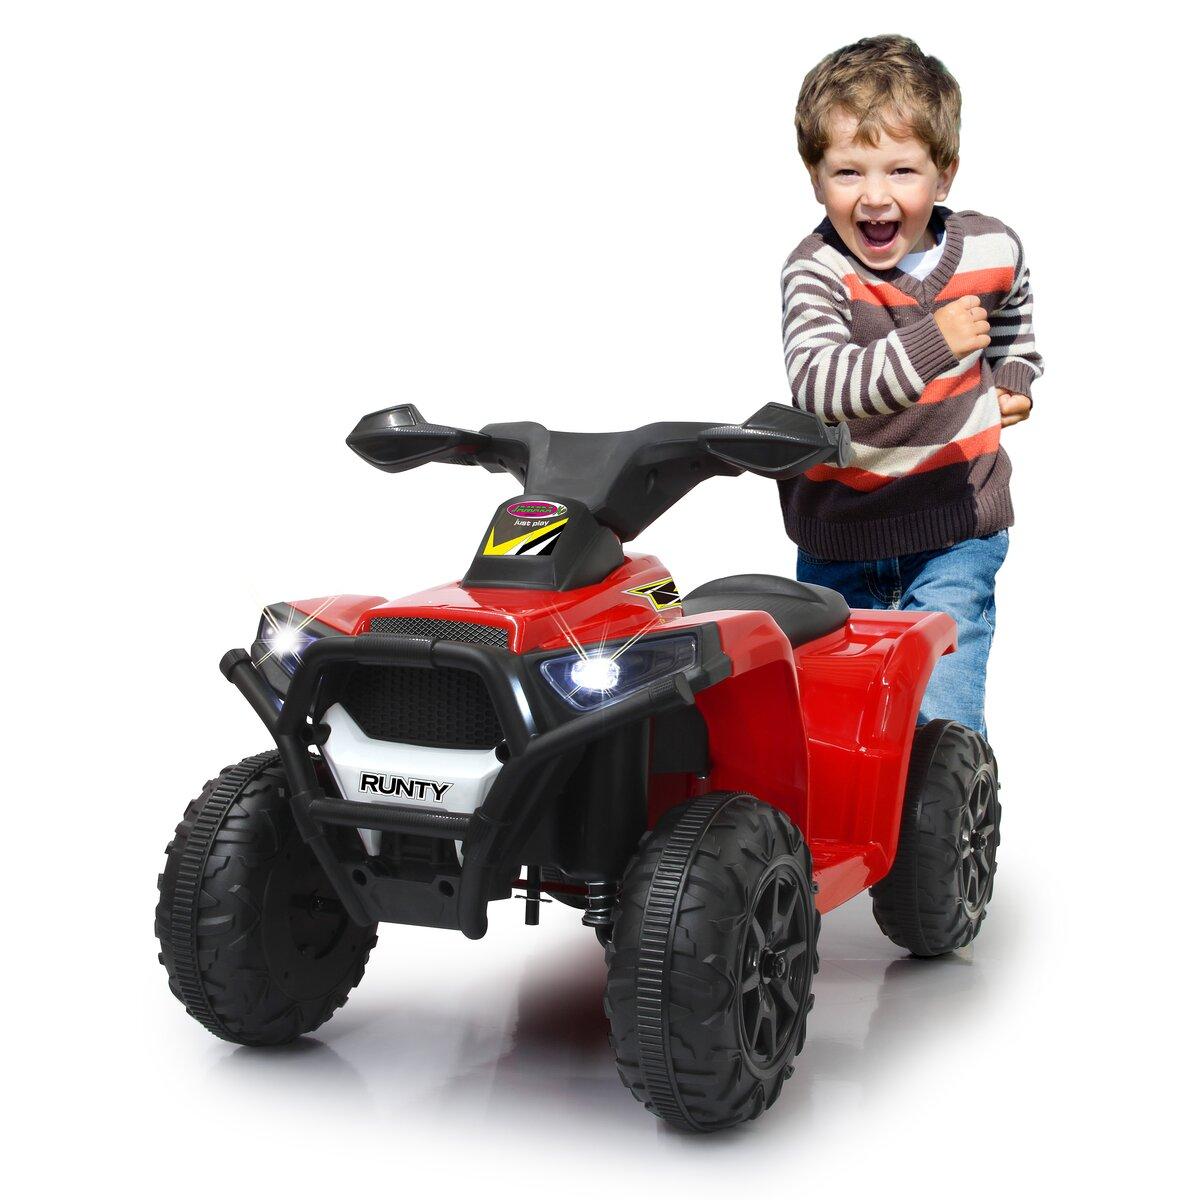 Jamara Ride-on Mini Quad Runty 6V červený